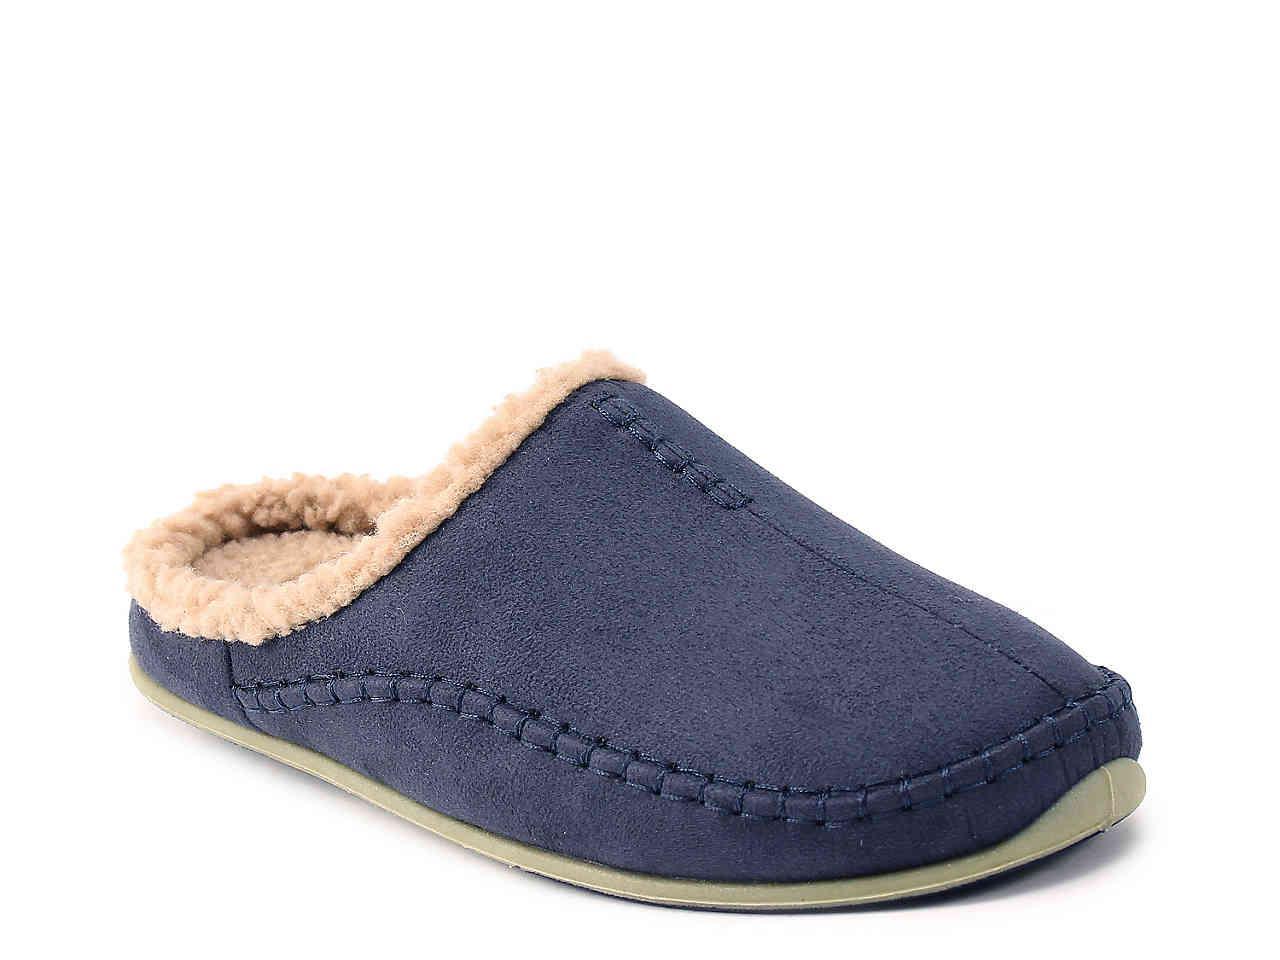 897eeedc4e1fb4 Lyst - Deer Stags Slipperooz Nordic Slipper in Blue for Men - Save 13%